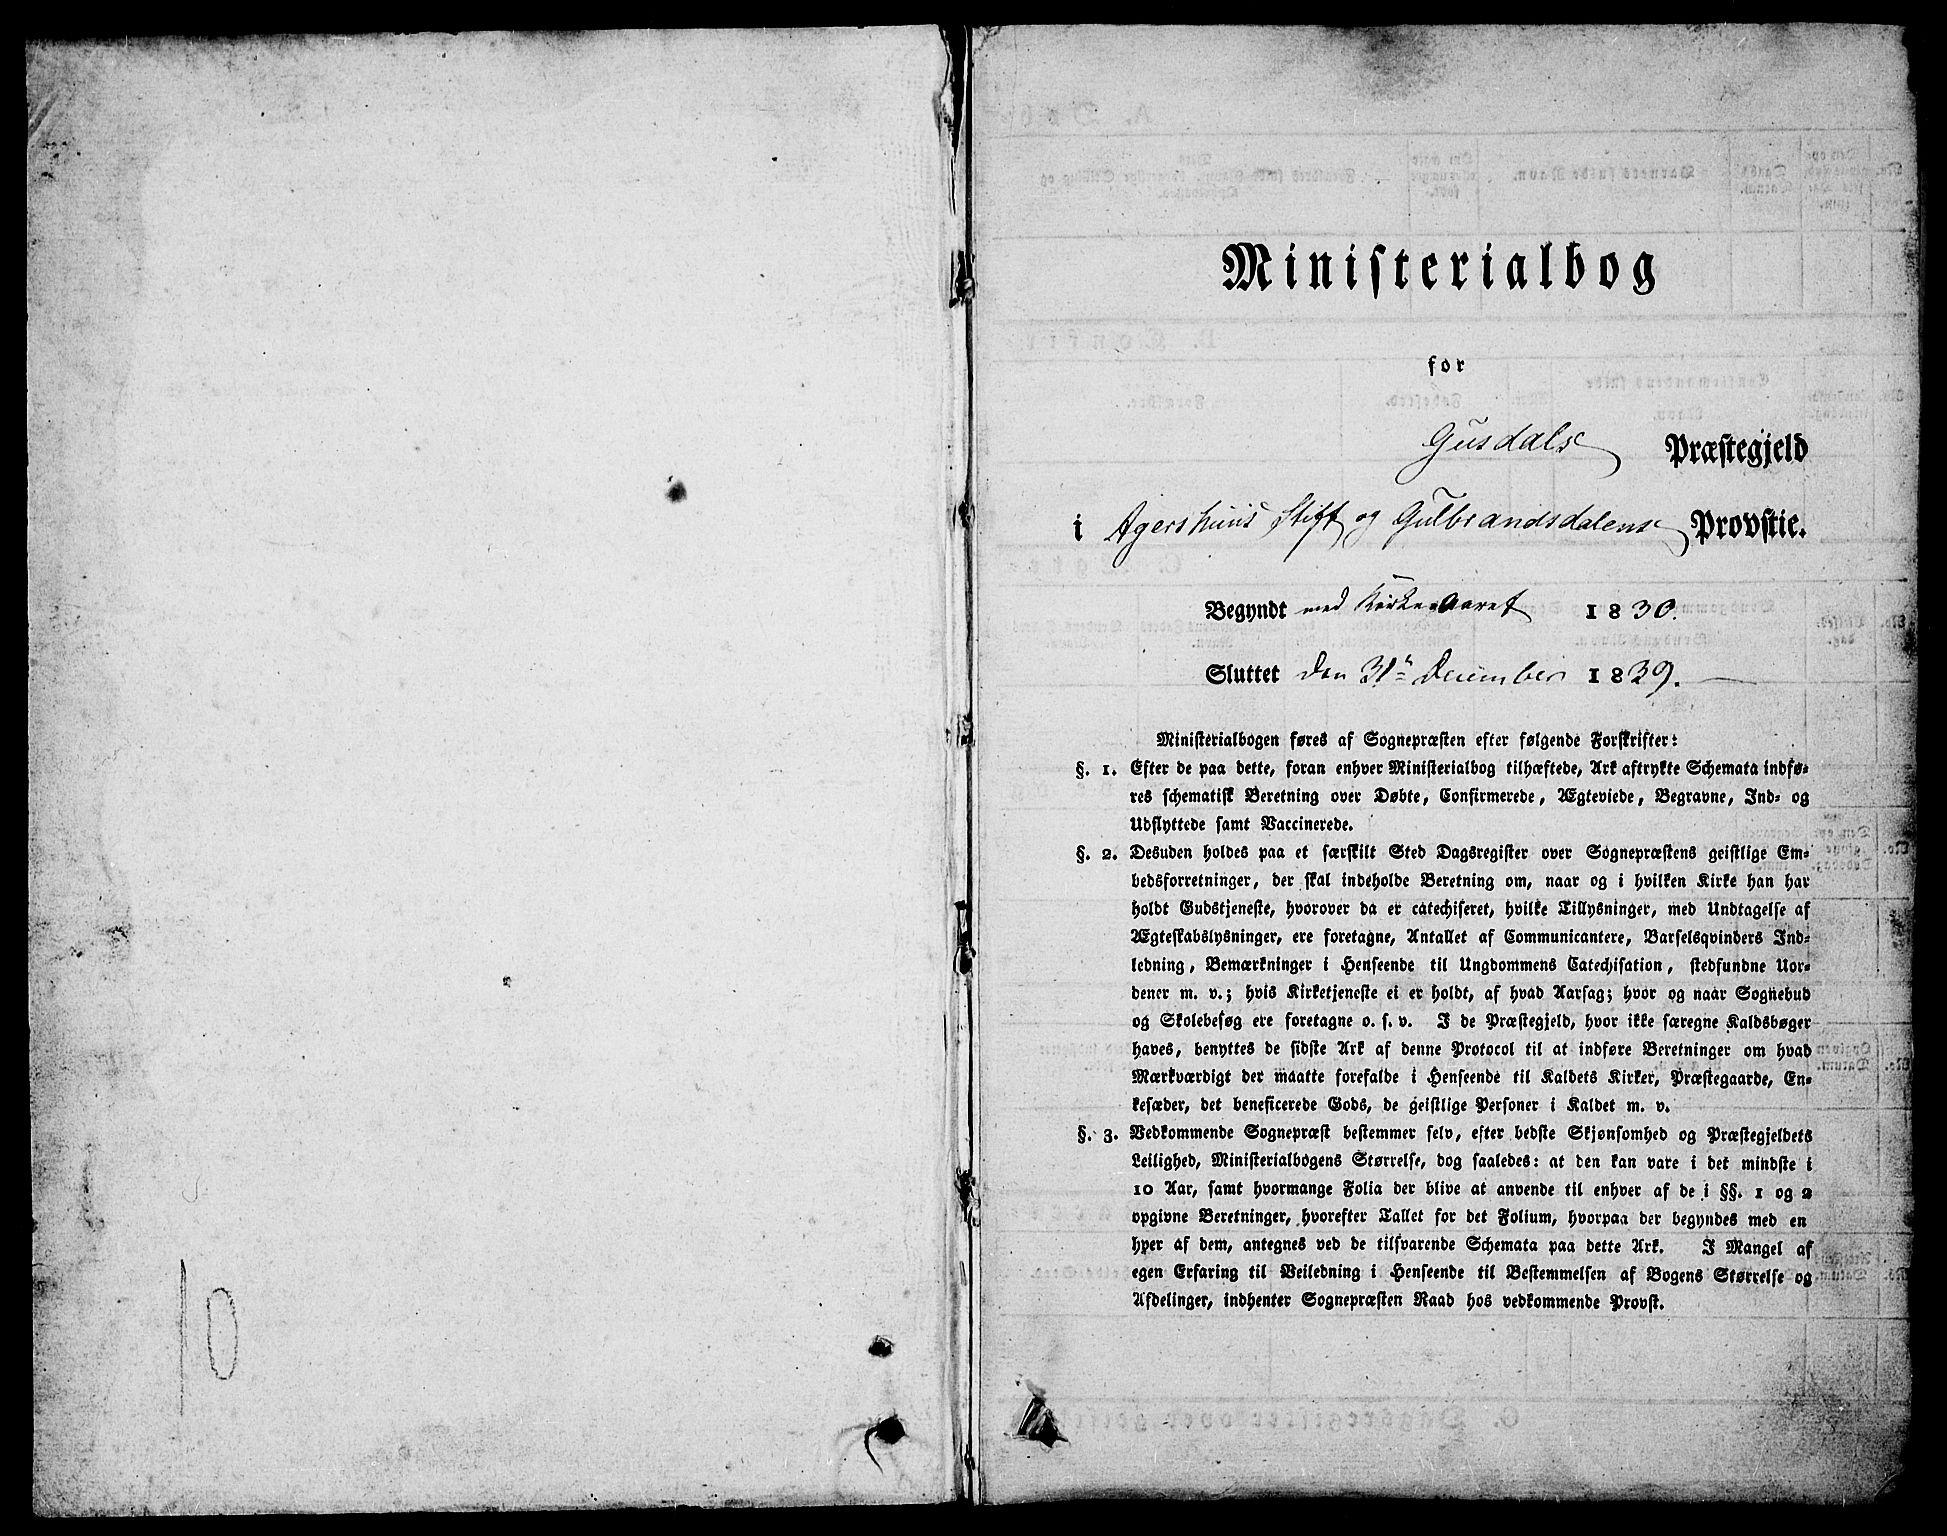 SAH, Gausdal prestekontor, Ministerialbok nr. 6, 1830-1839